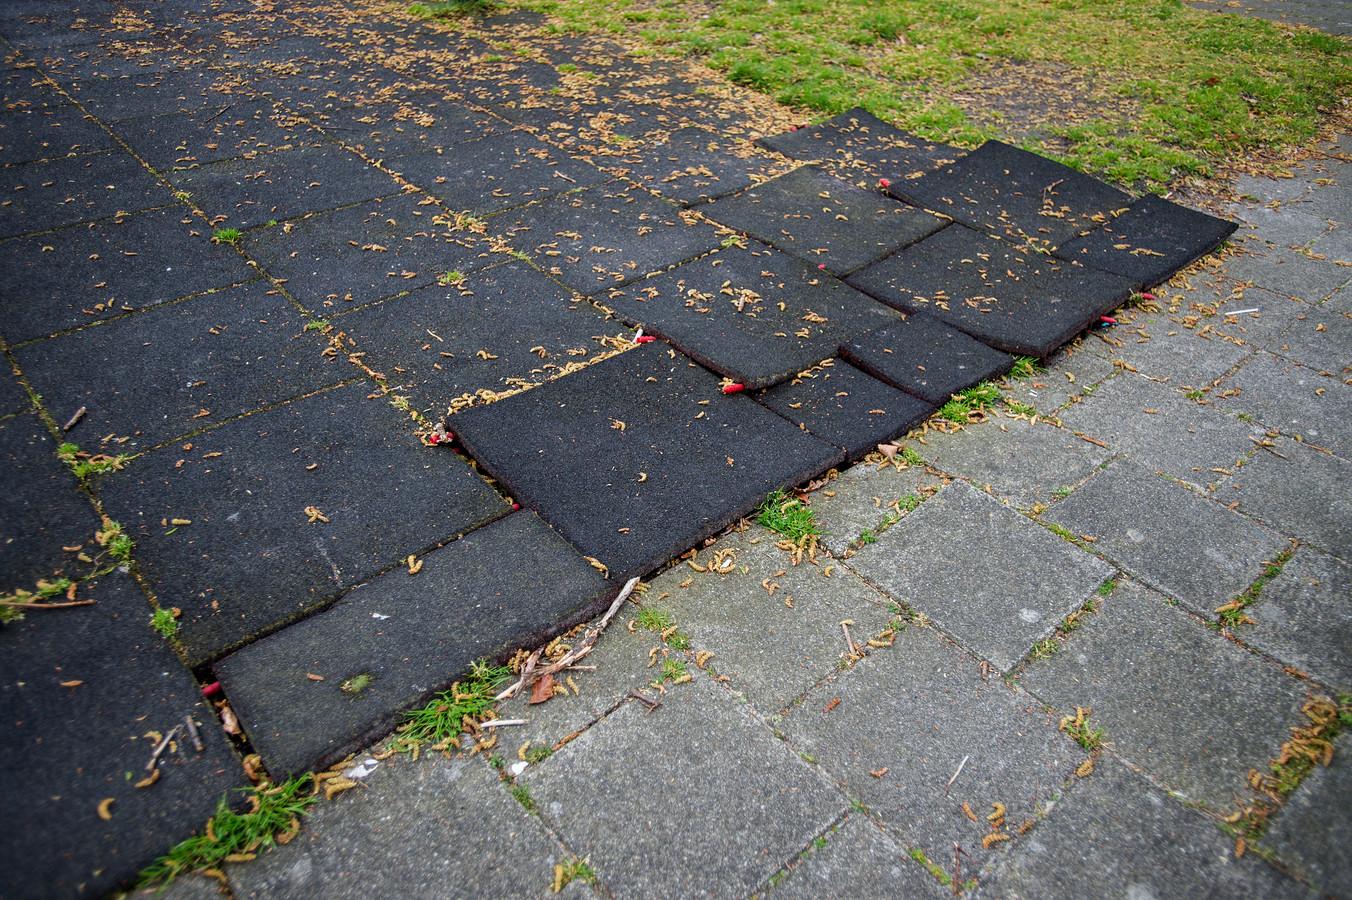 Losliggende tegels. Foto ter illustratie.